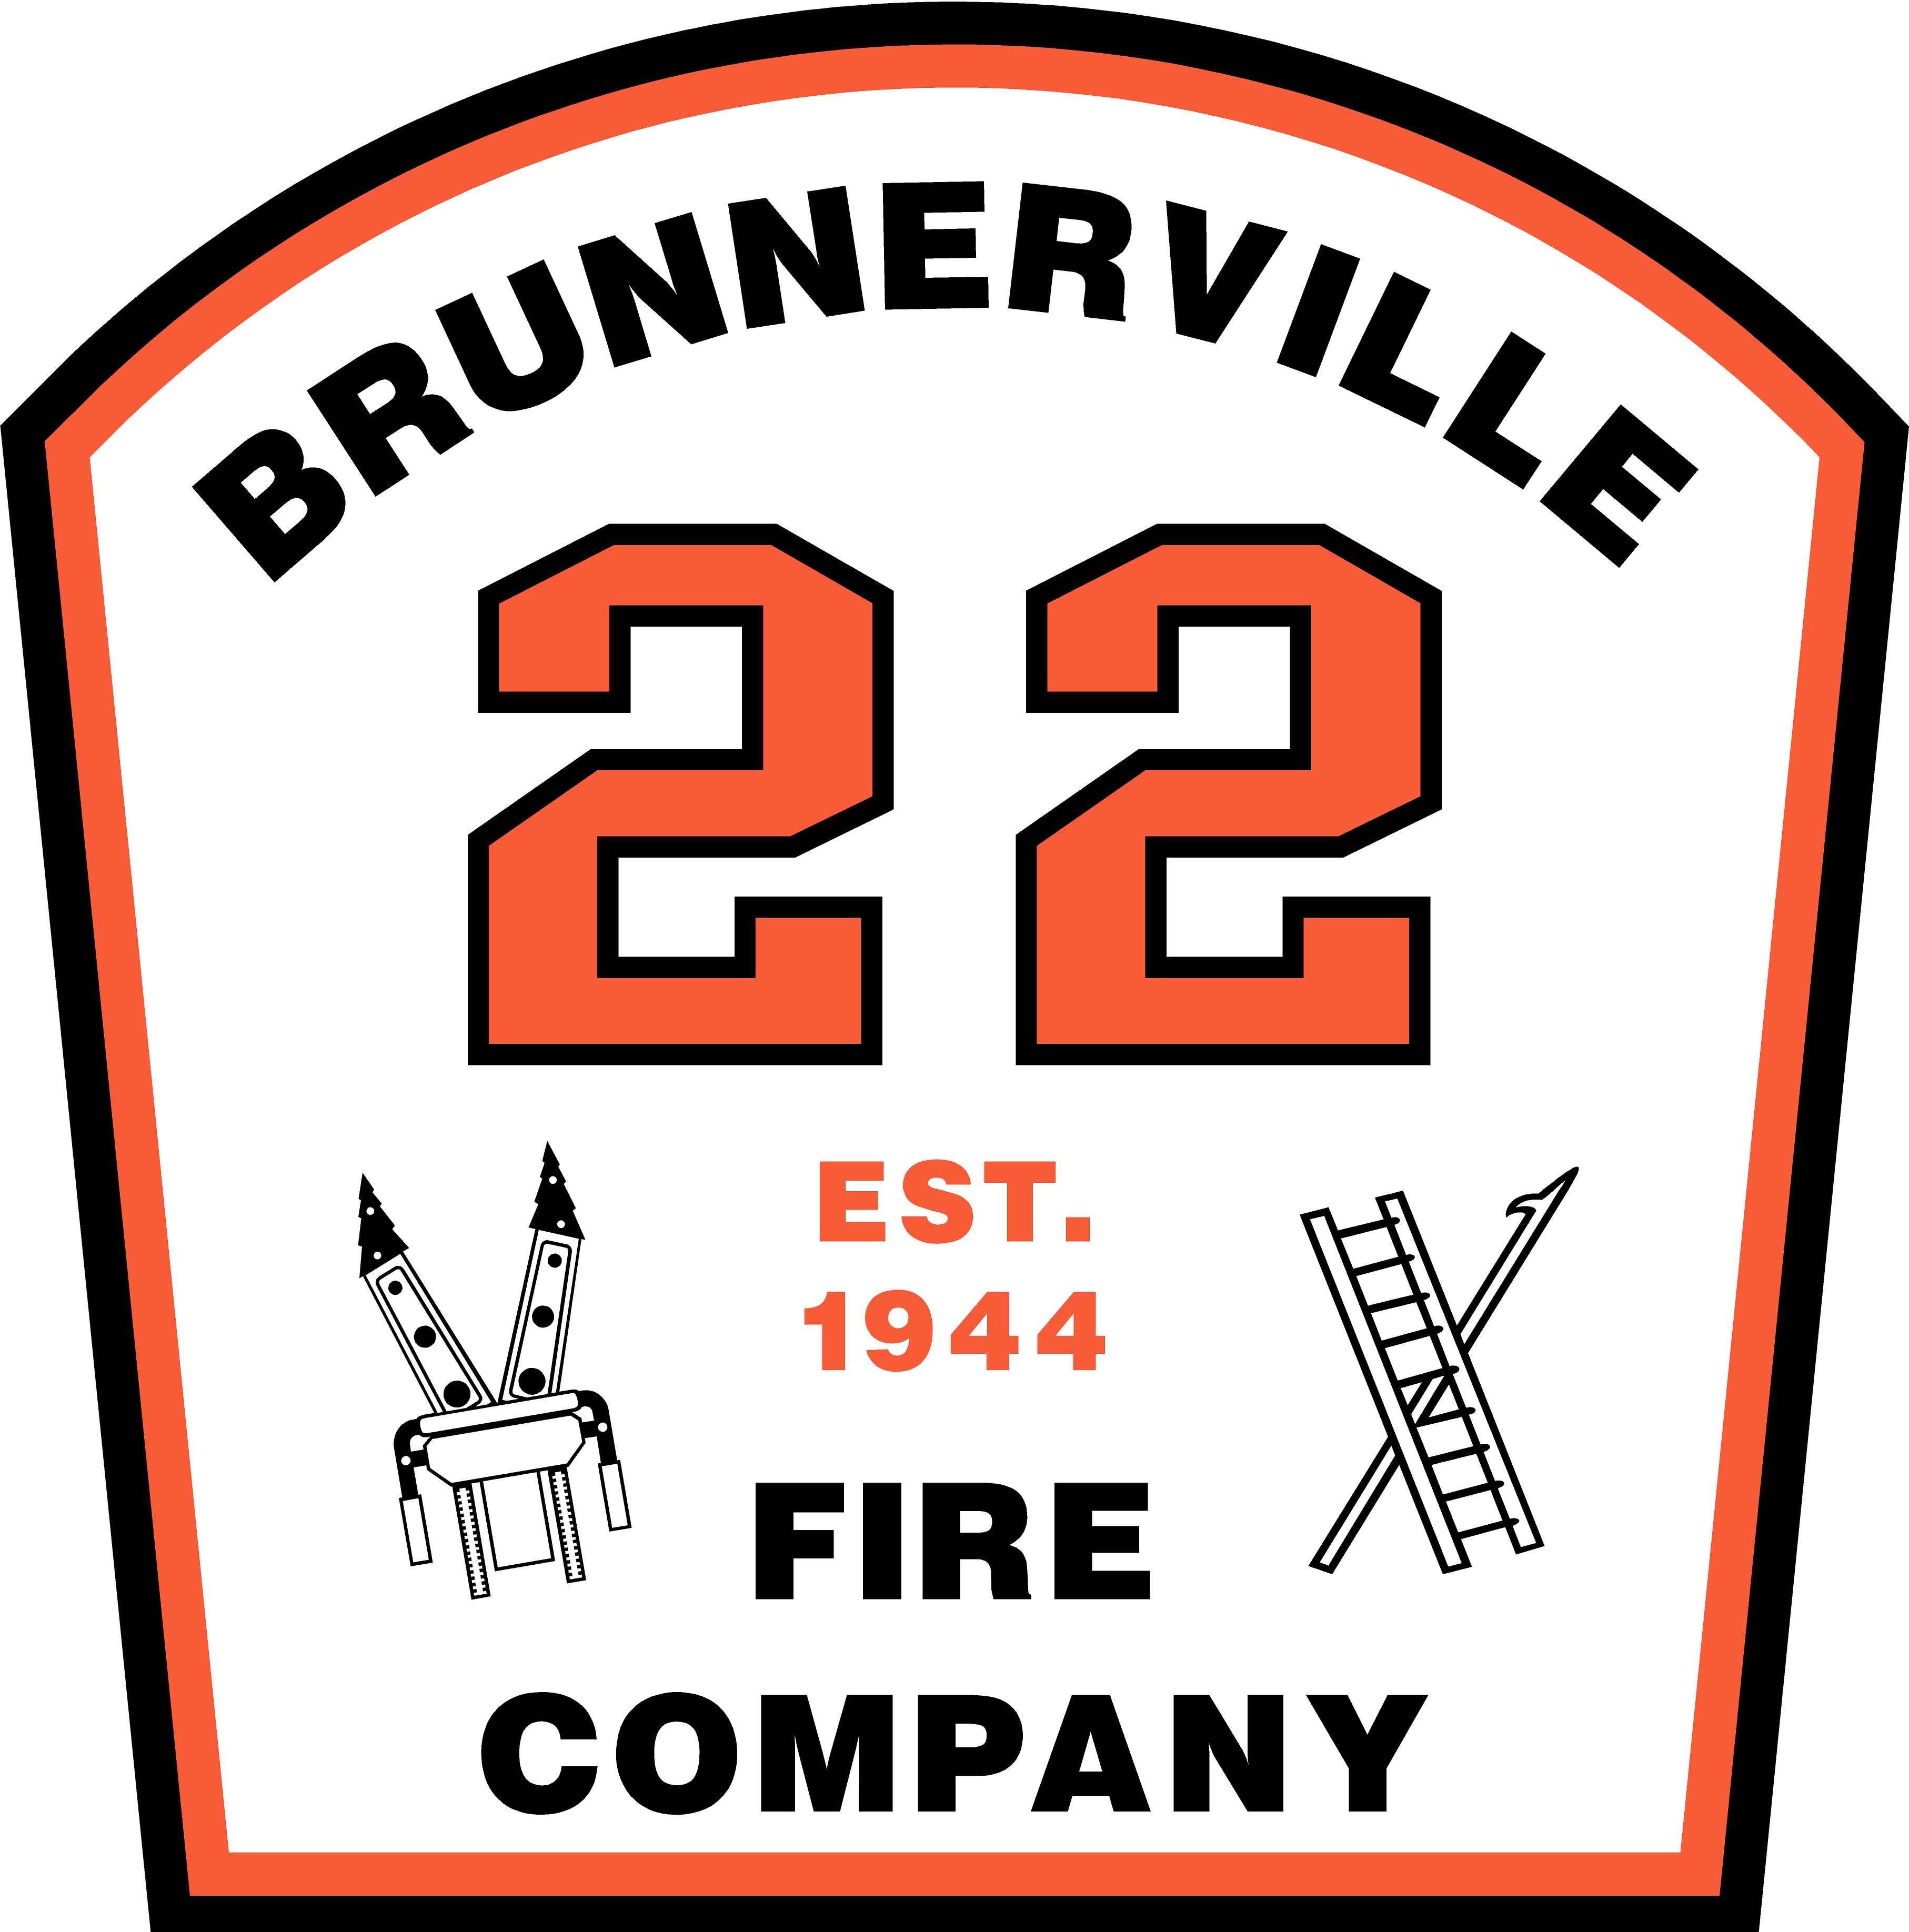 Brunnerville Fire Company